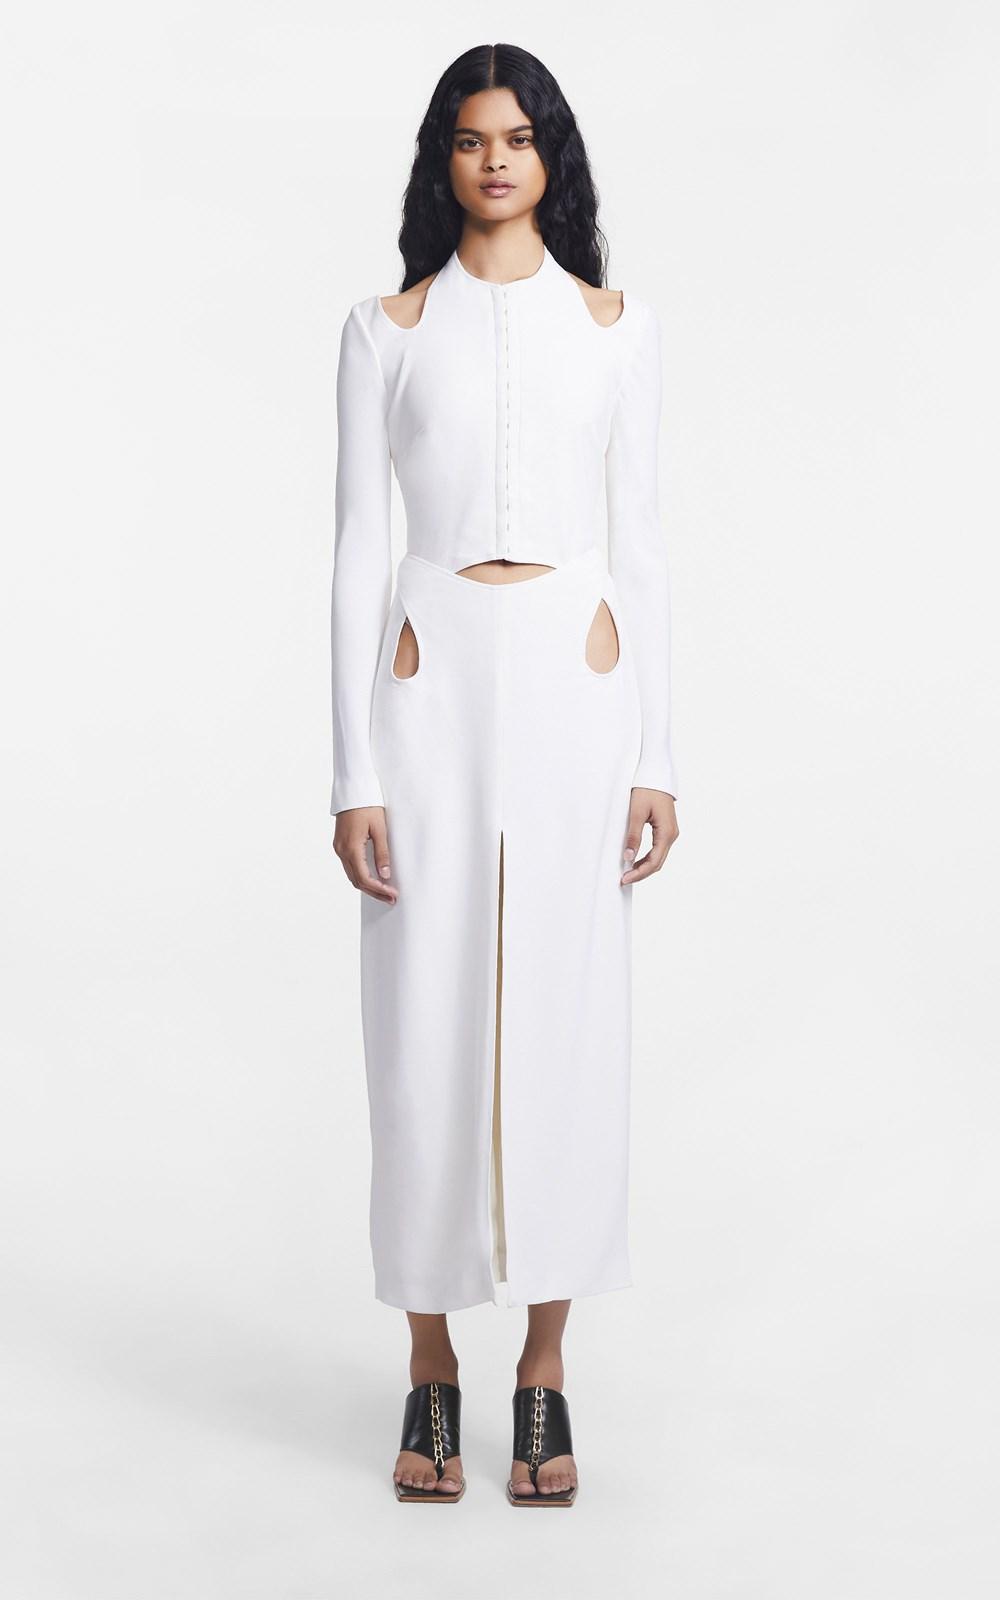 New  | DOUBLE LOOP LS DRESS